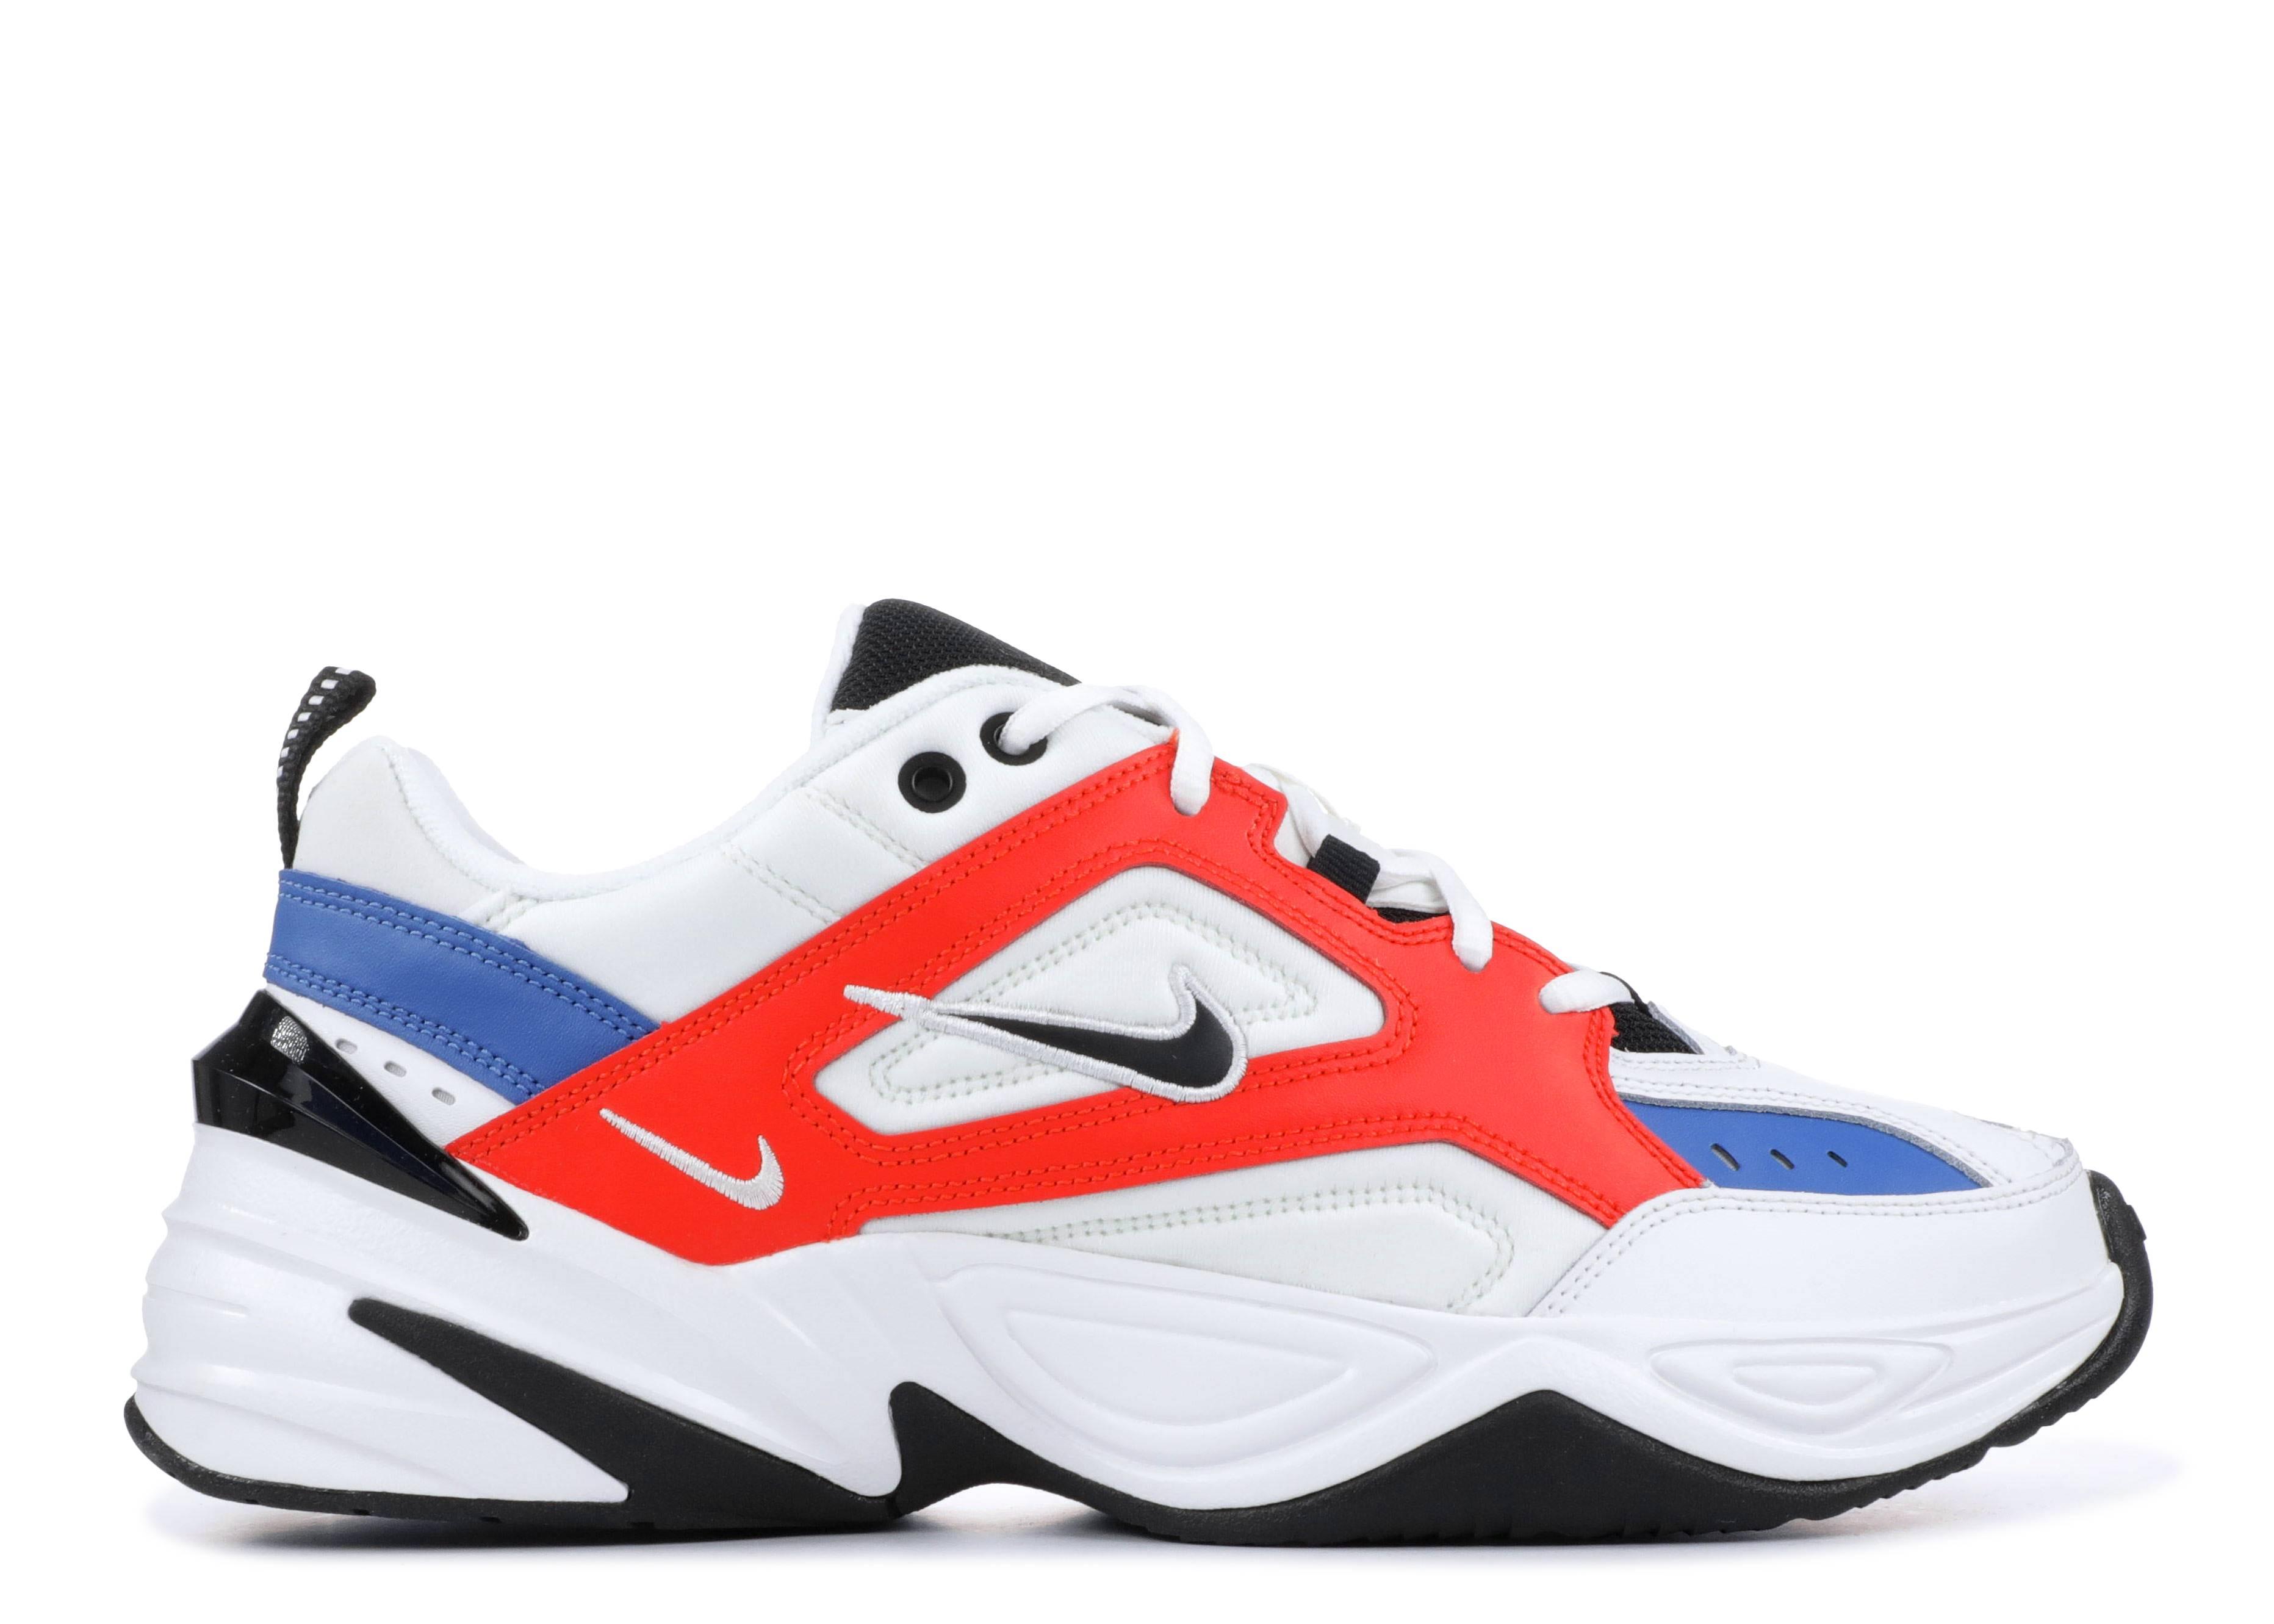 official photos e7744 740a8 Nike M2k Tekno - Nike - av4789 100 - summit white black-team orange ...